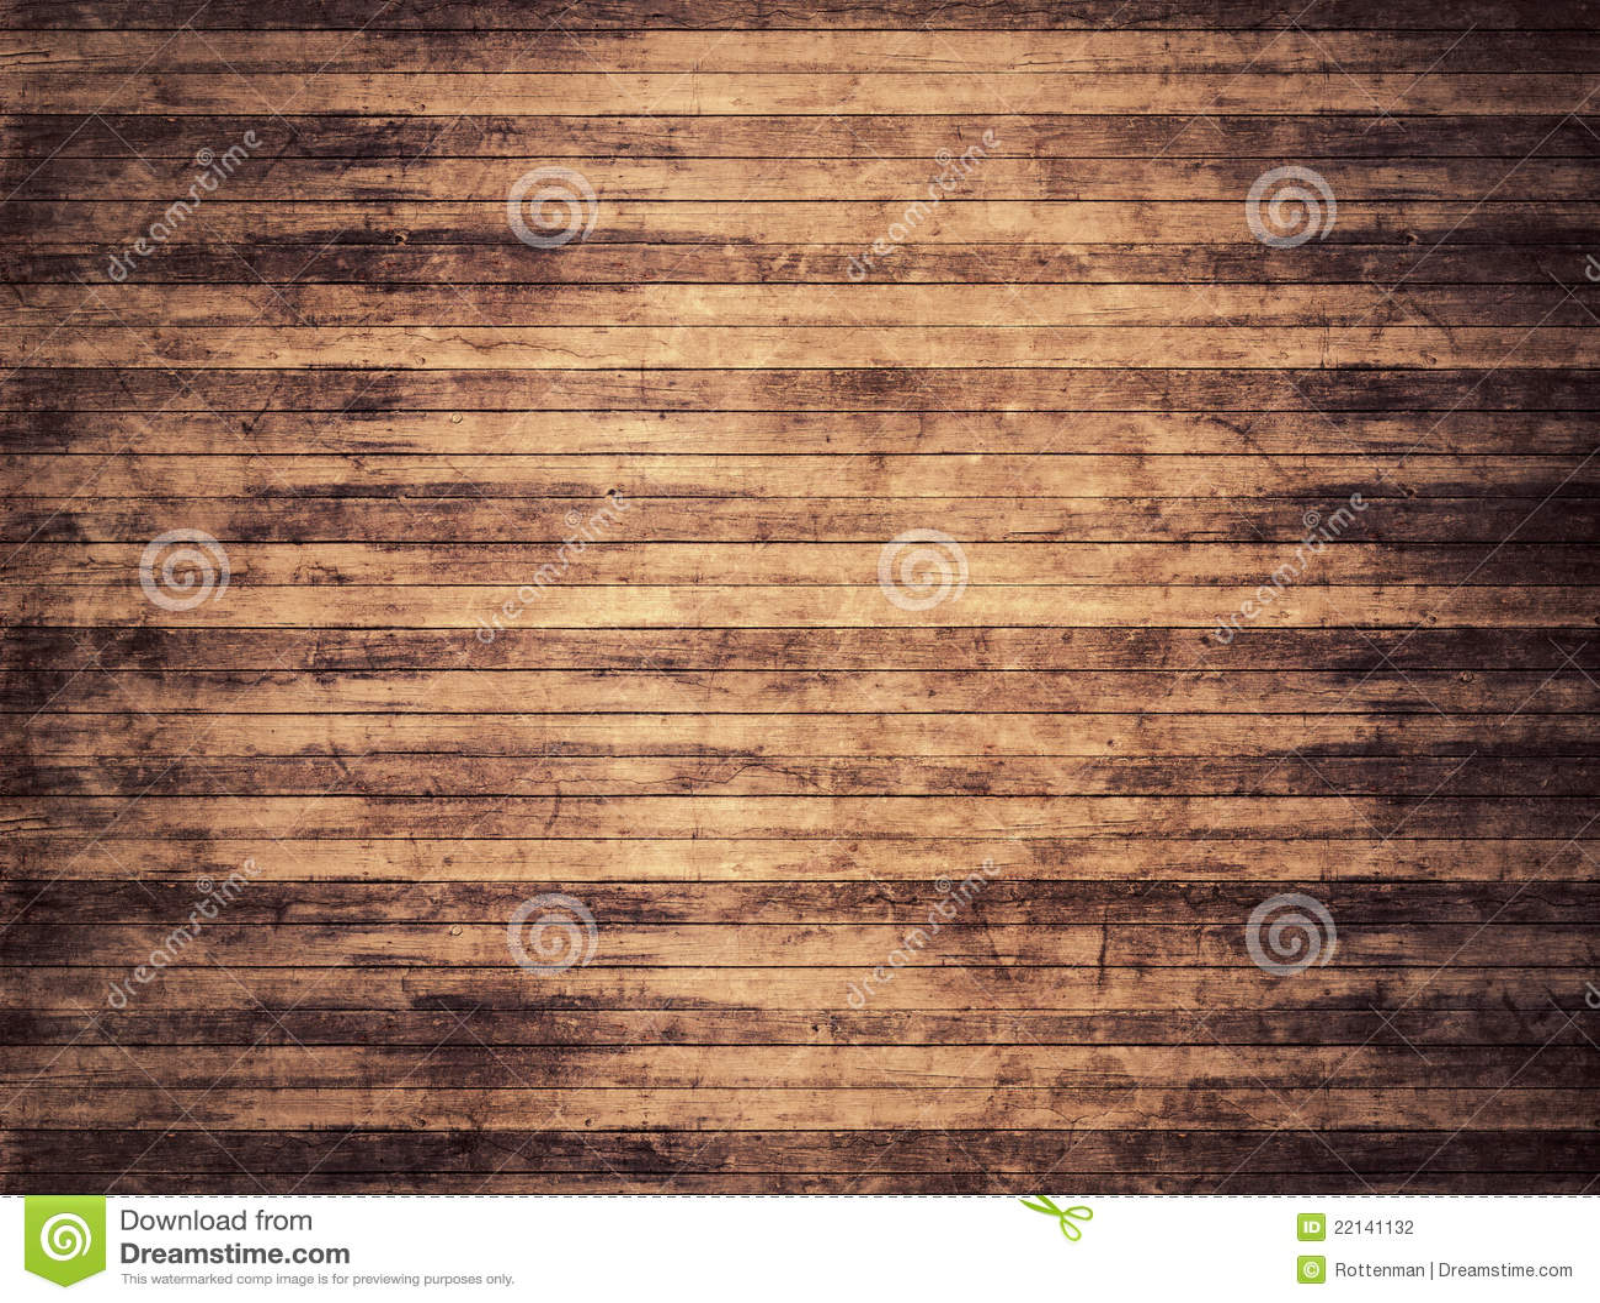 Textura fina de tablones de madera - Tablones de madera baratos ...